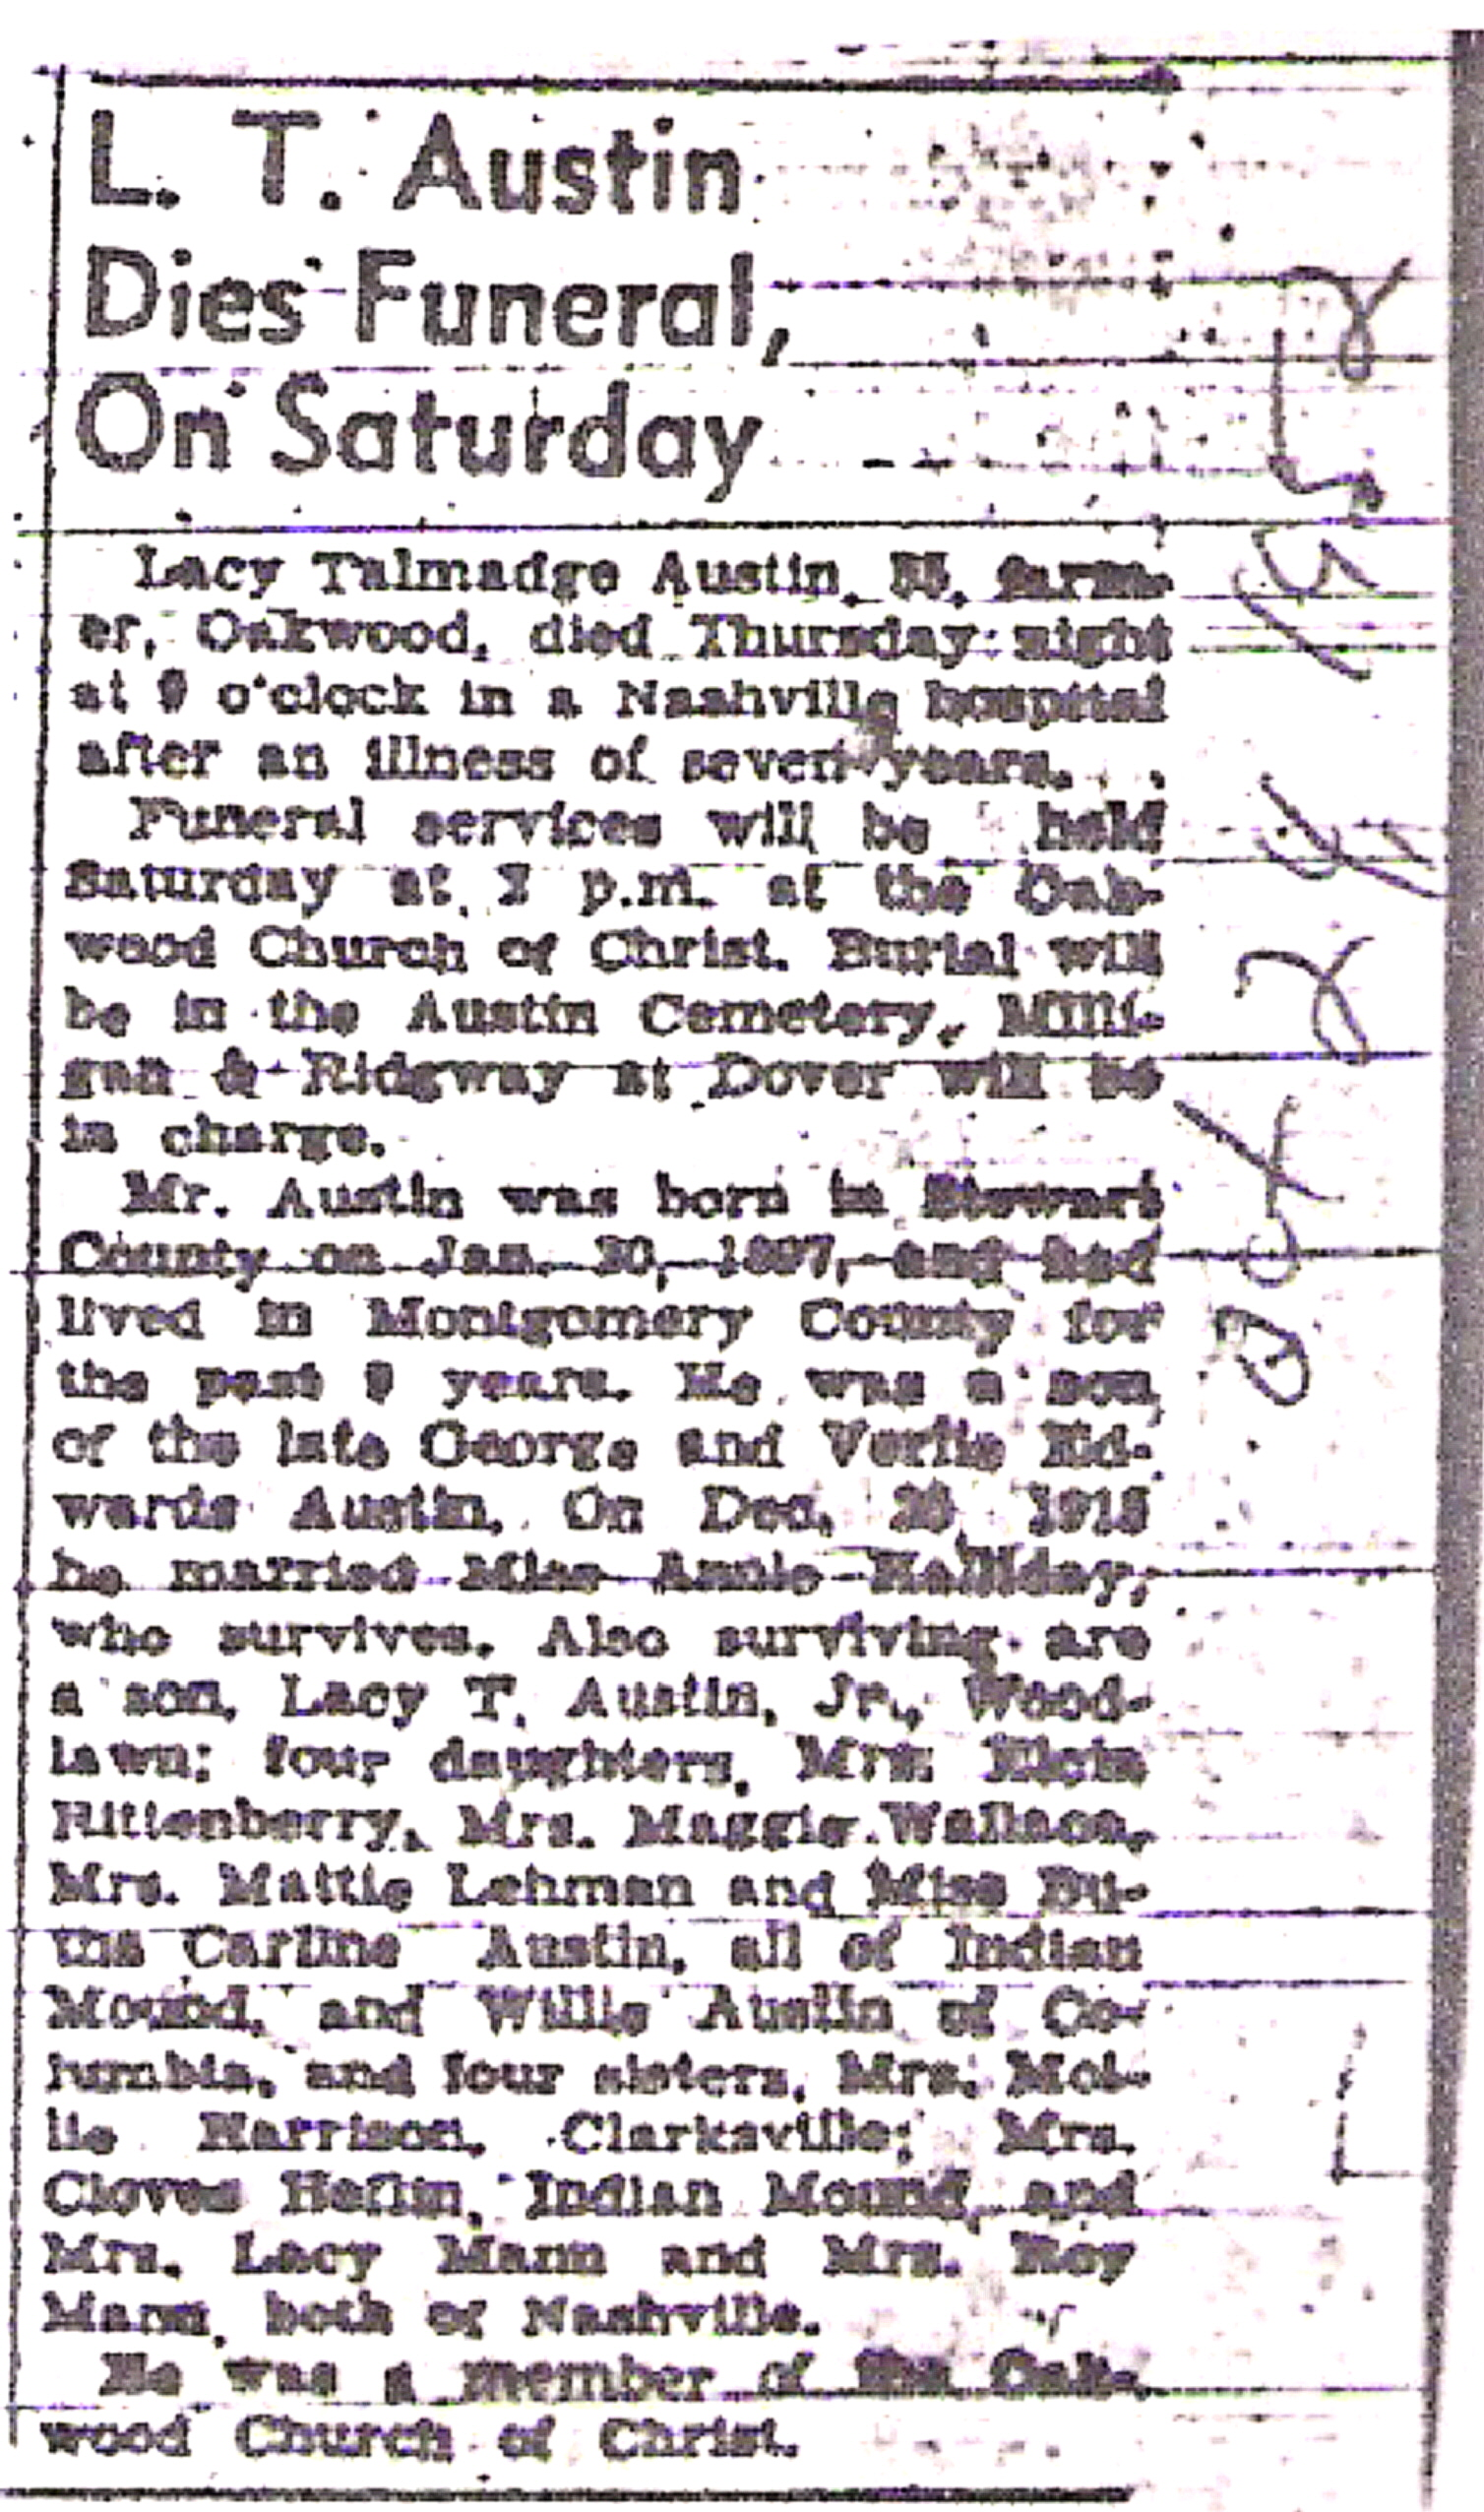 Montie Talmadge Austin